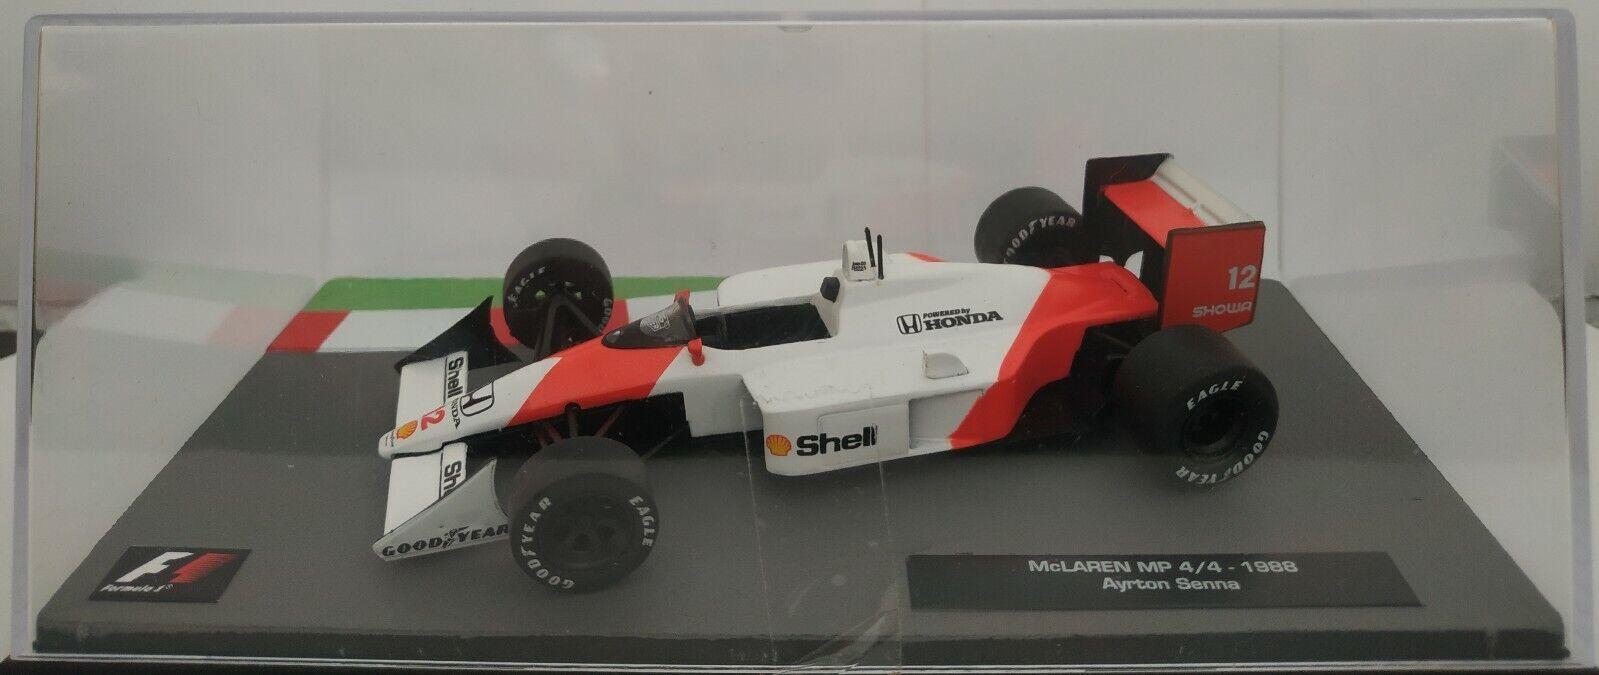 1 43 mclaren mp 4 4 mp4 1988  ayrton senna f1 Formula 1 IXO Altaya Diecast scale  les clients d'abord la réputation d'abord